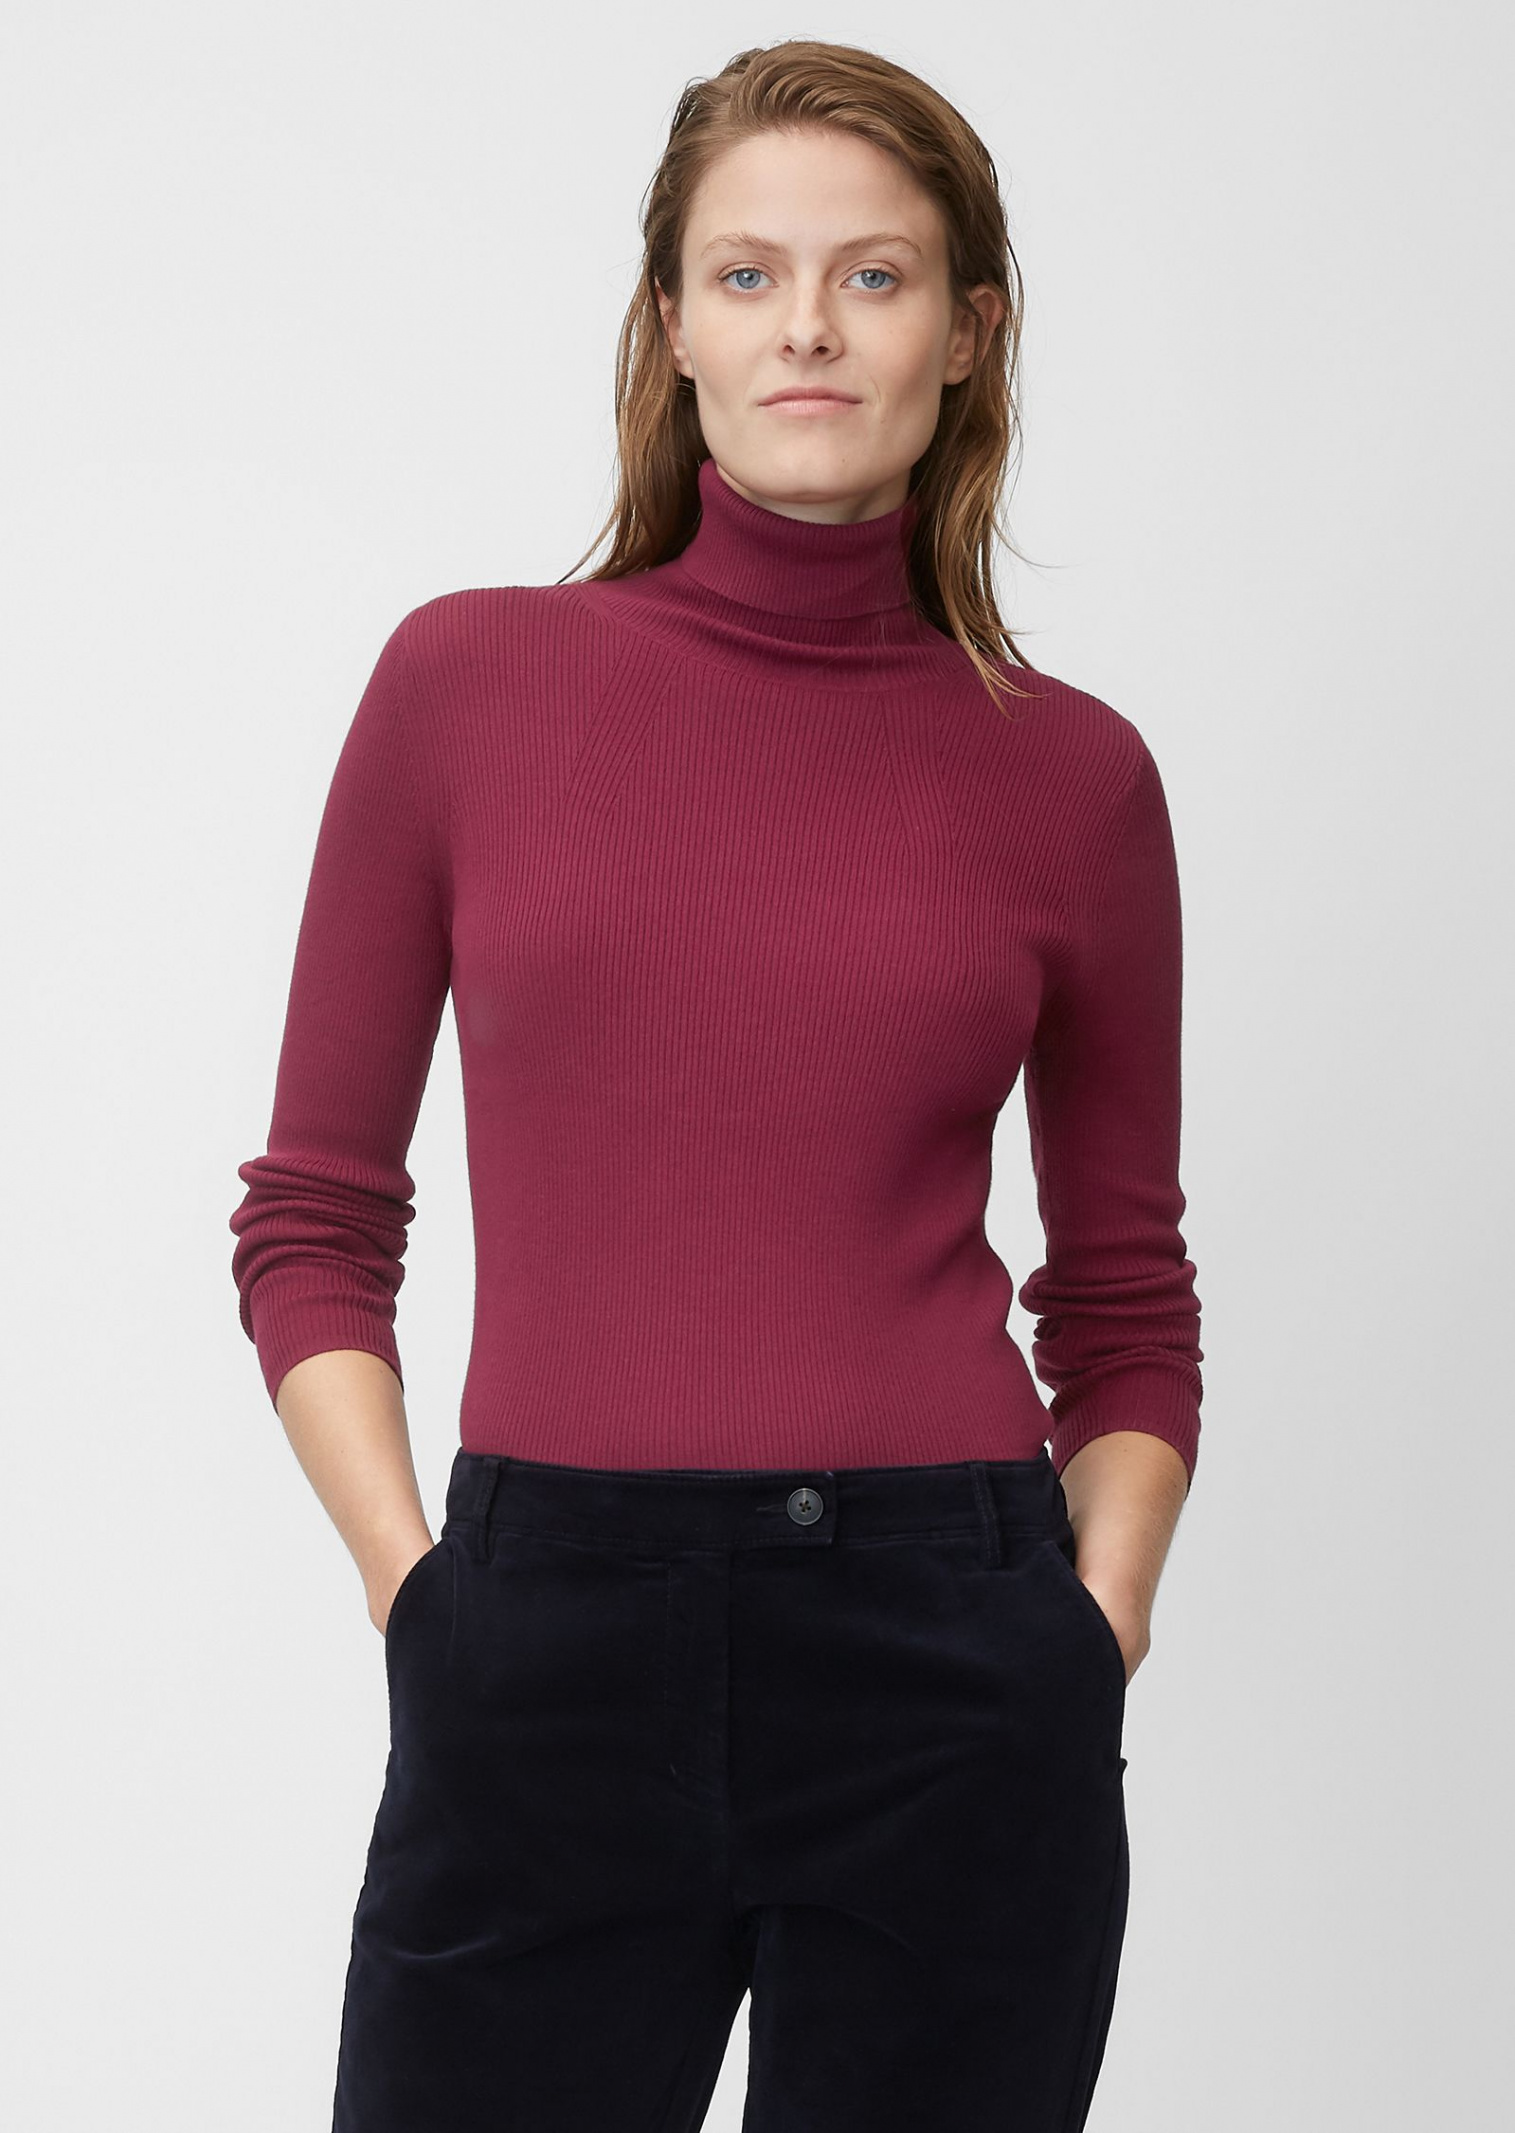 Кофты и свитера женские MARC O'POLO модель PF3860 характеристики, 2017